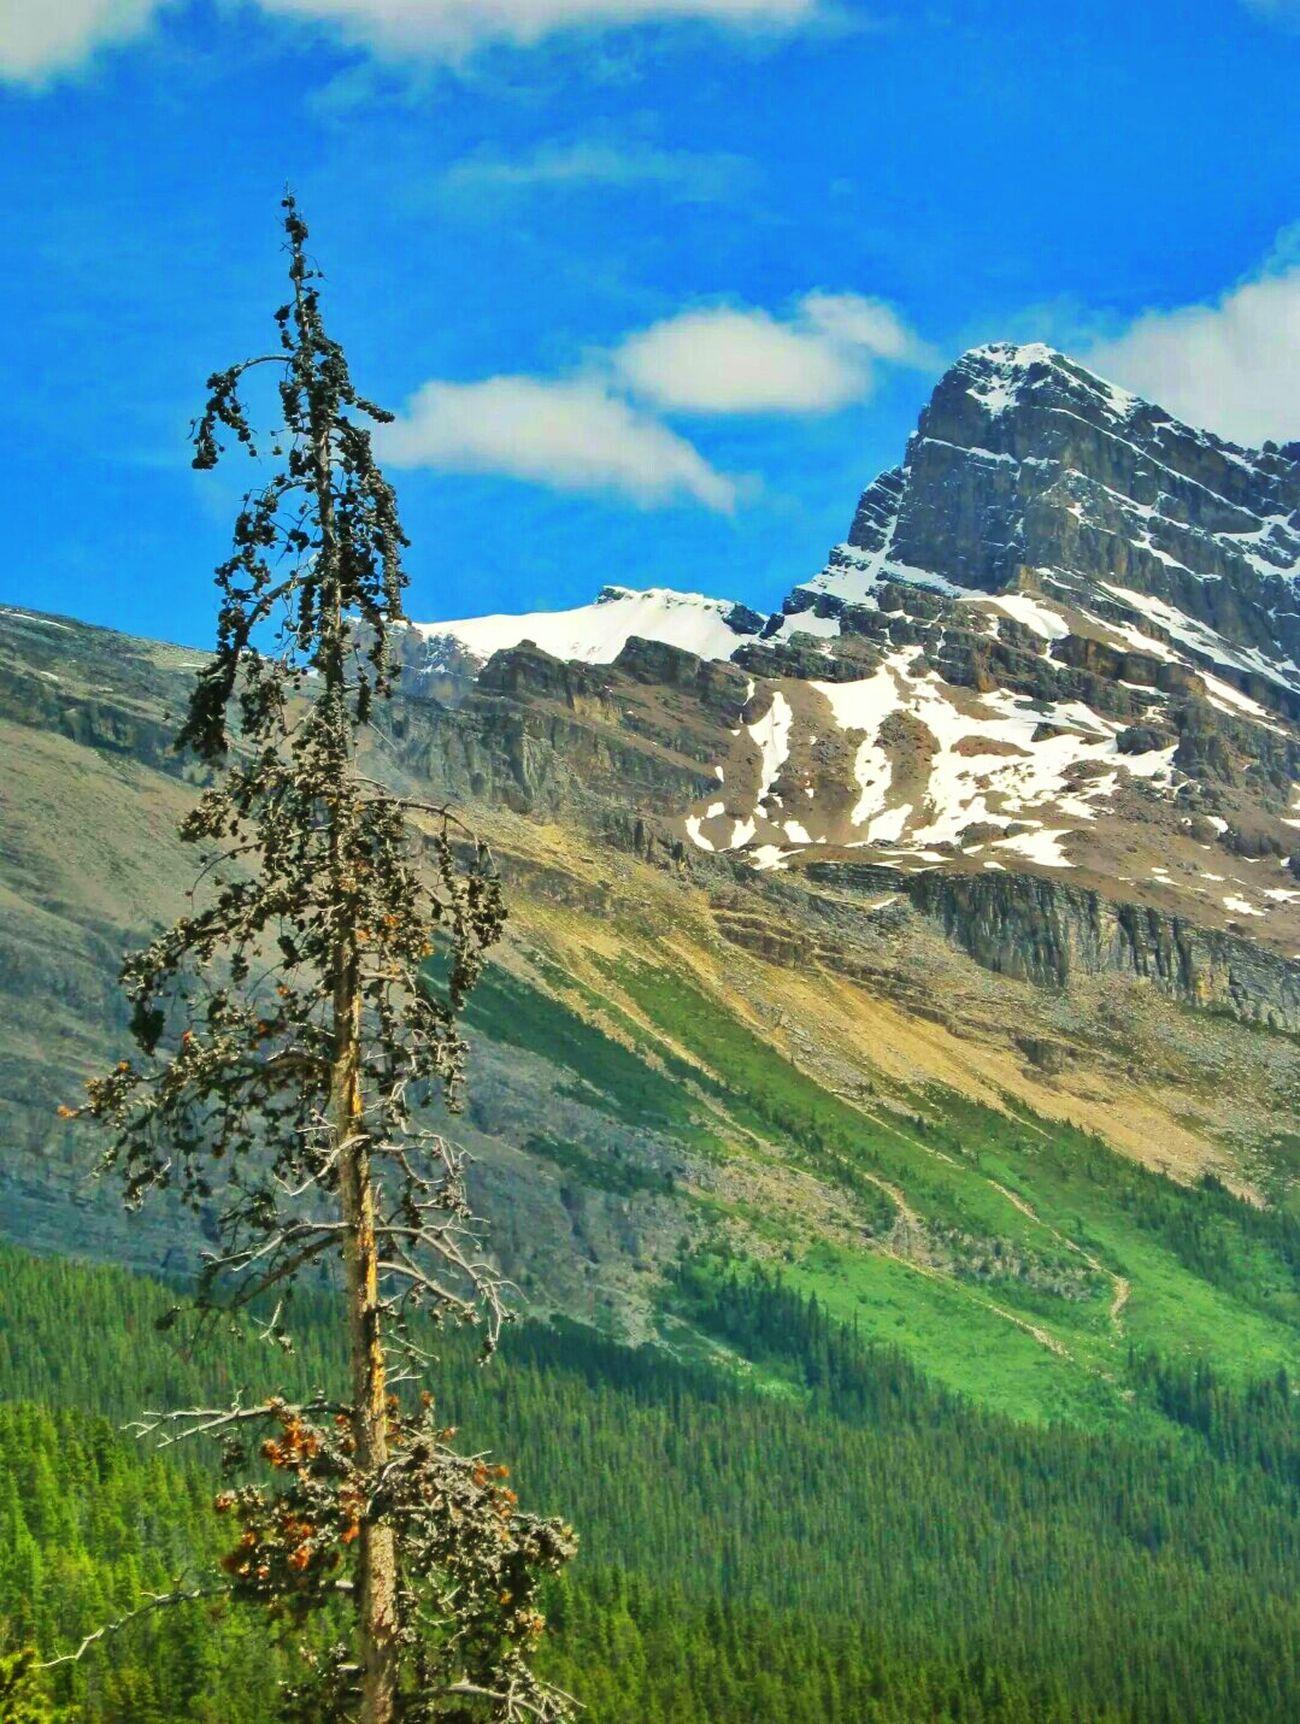 Landscape Mountains Tree